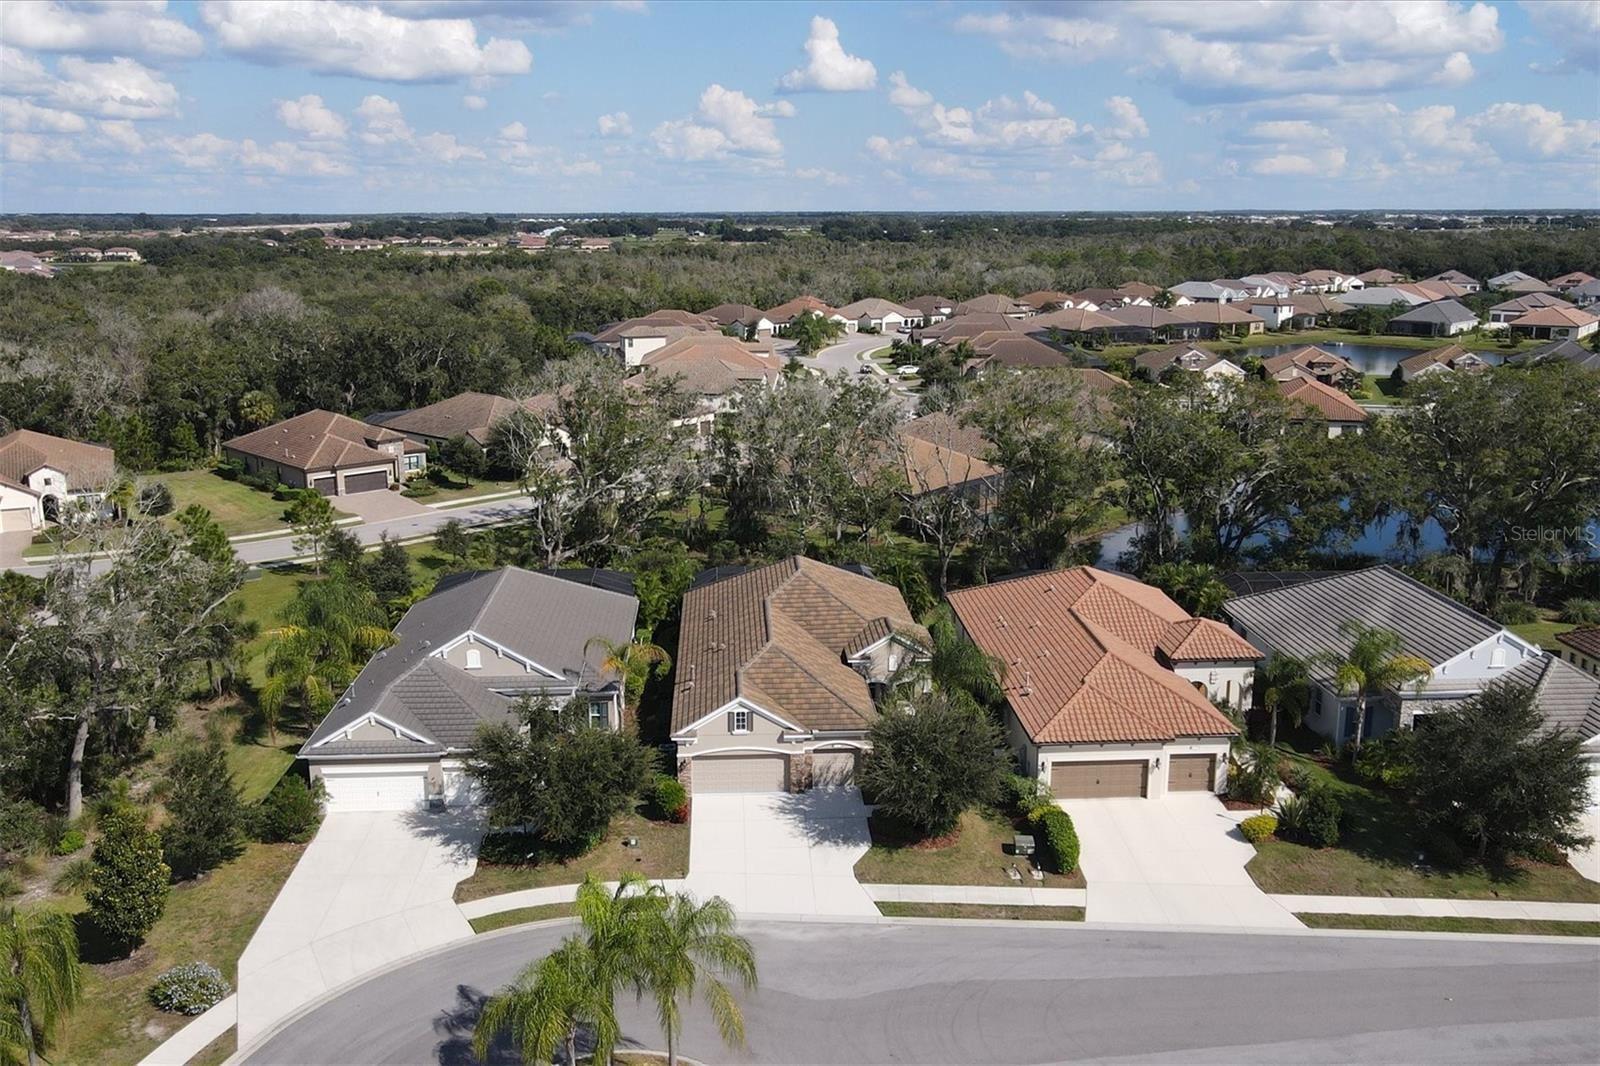 Photo of 4015 CELESTIAL BLUE COURT, BRADENTON, FL 34211 (MLS # A4515184)